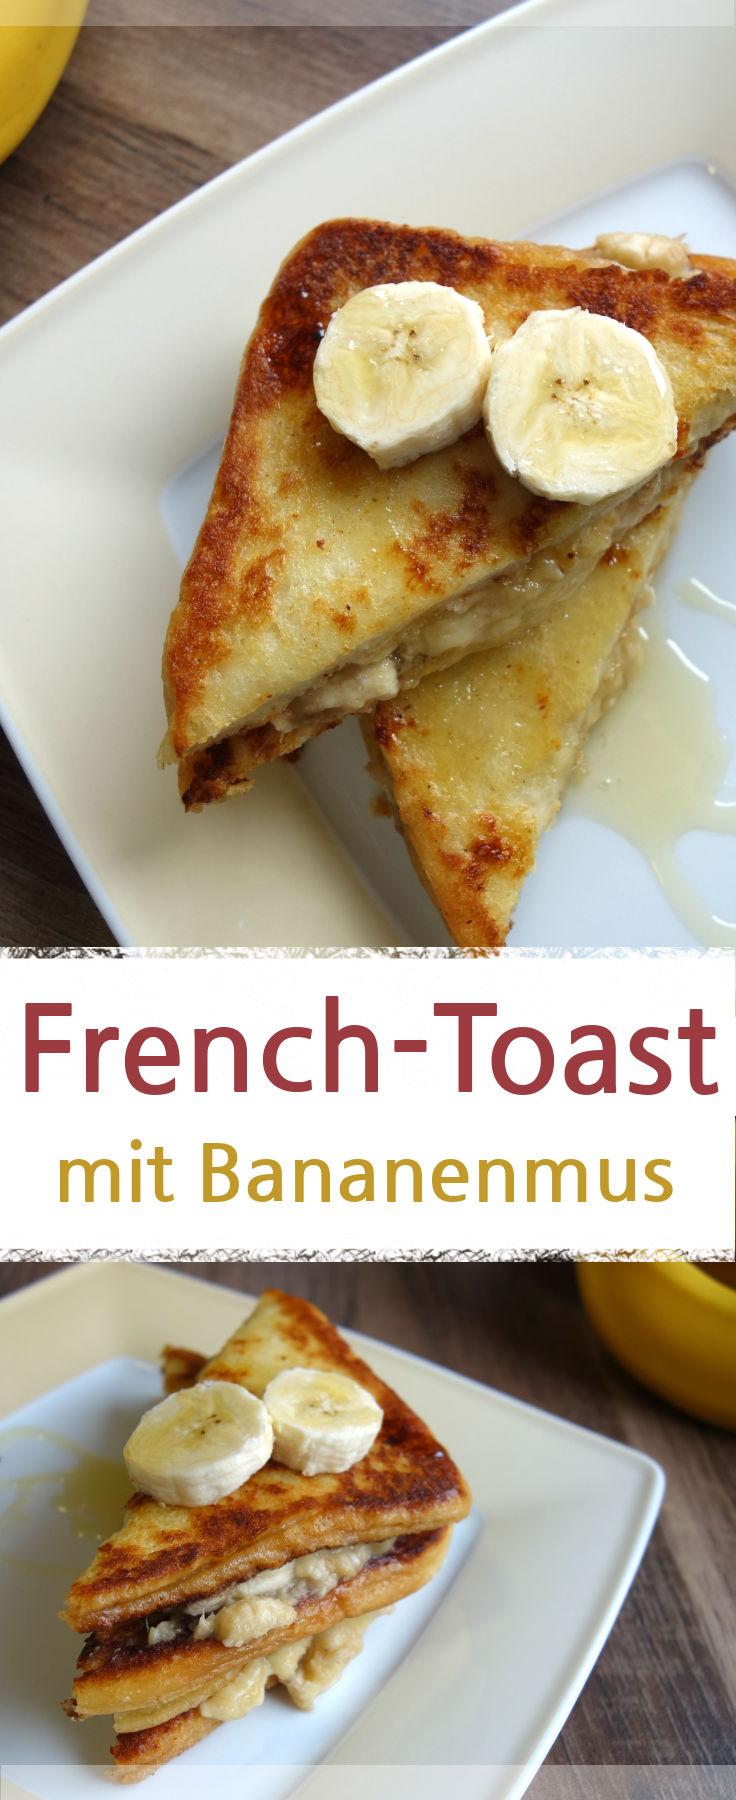 french-toast-bananenmus-wl.jpg